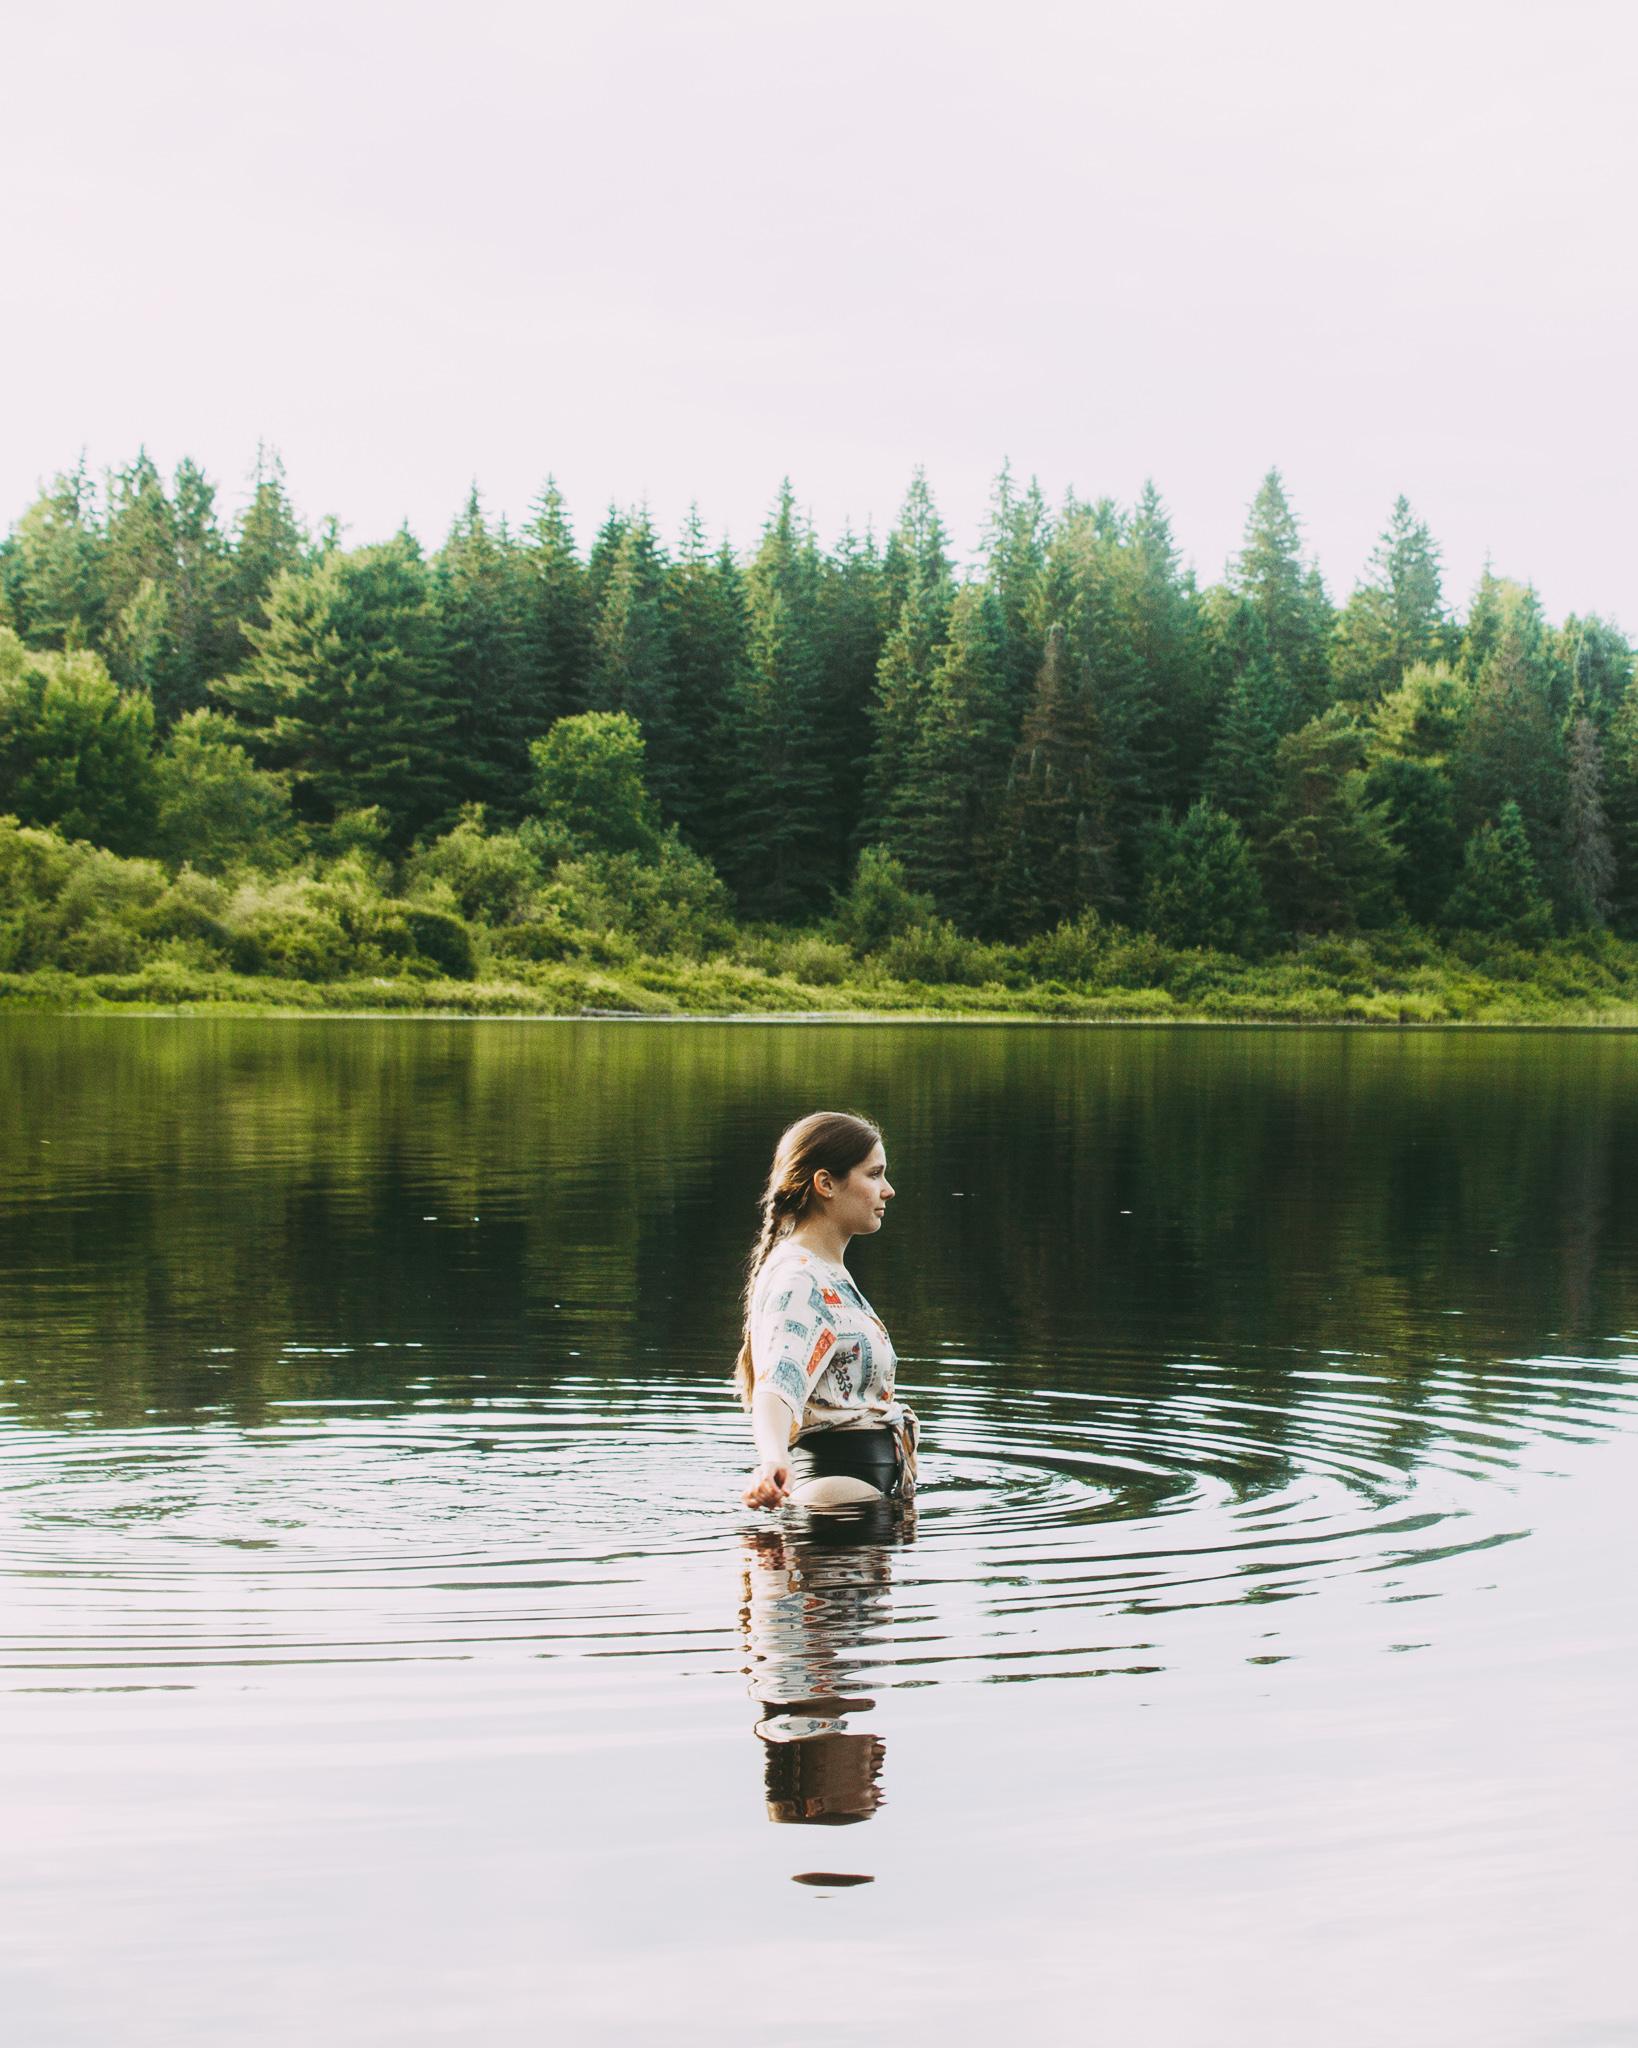 Swimming in Kearney Lake, Ontario